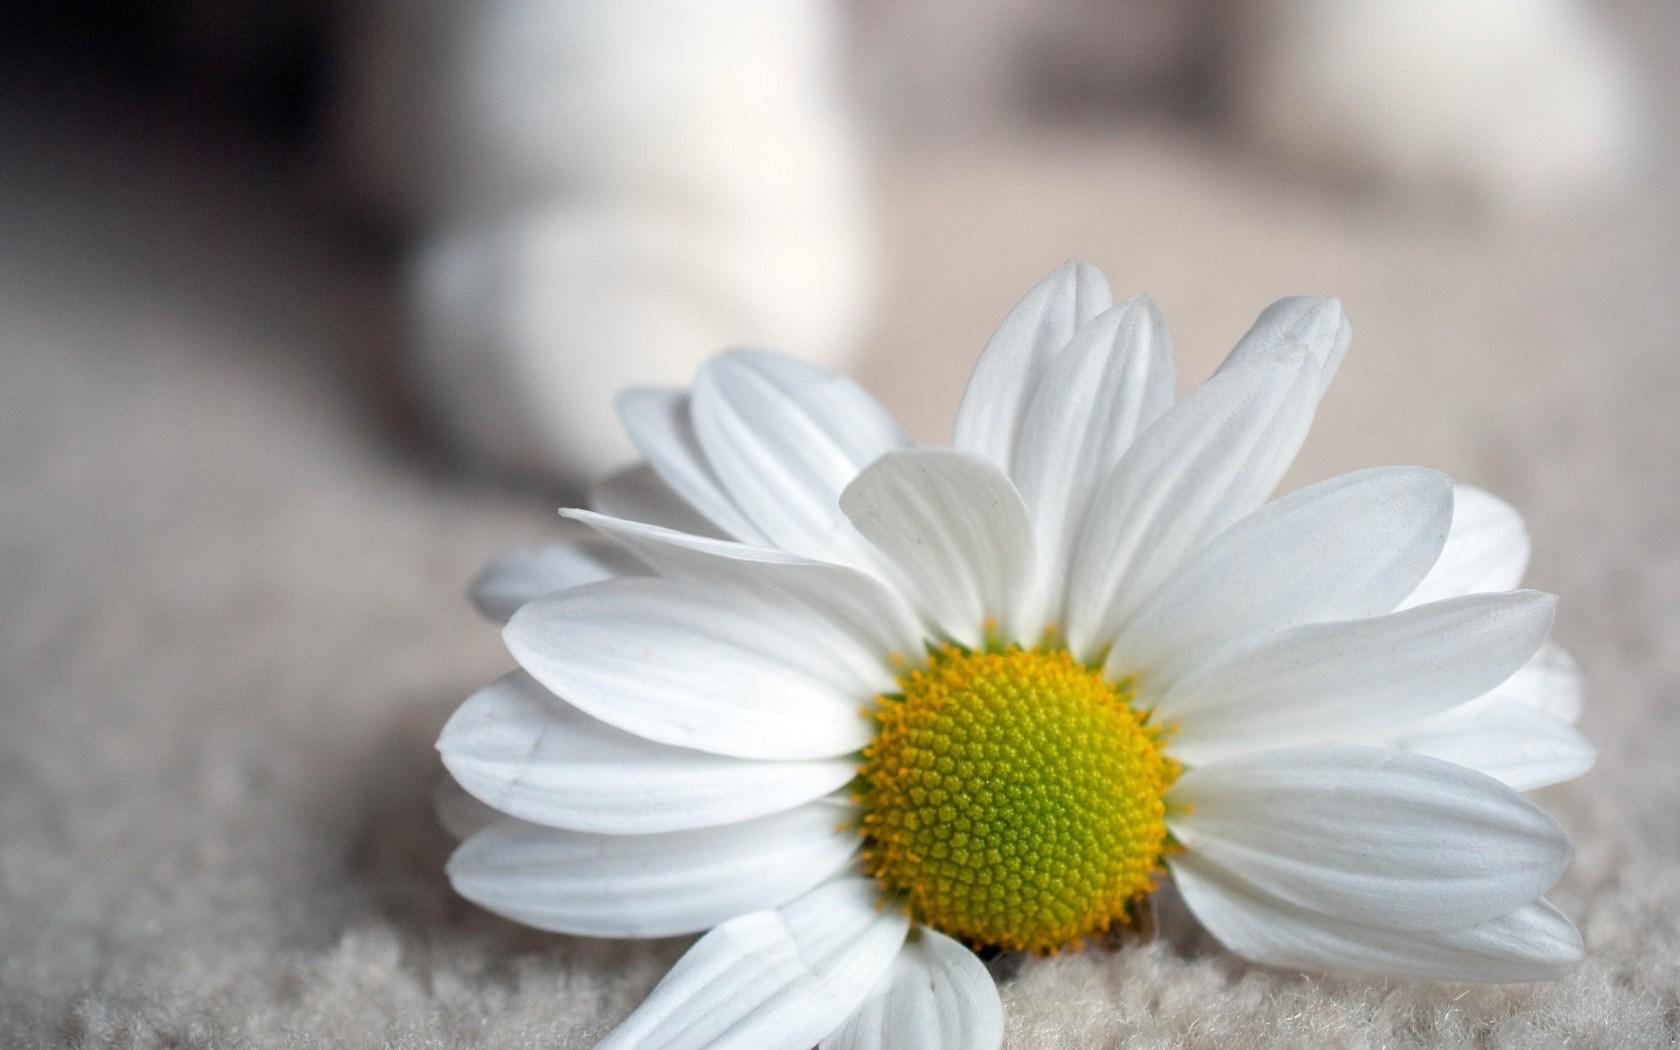 Flower Daisy Petals White